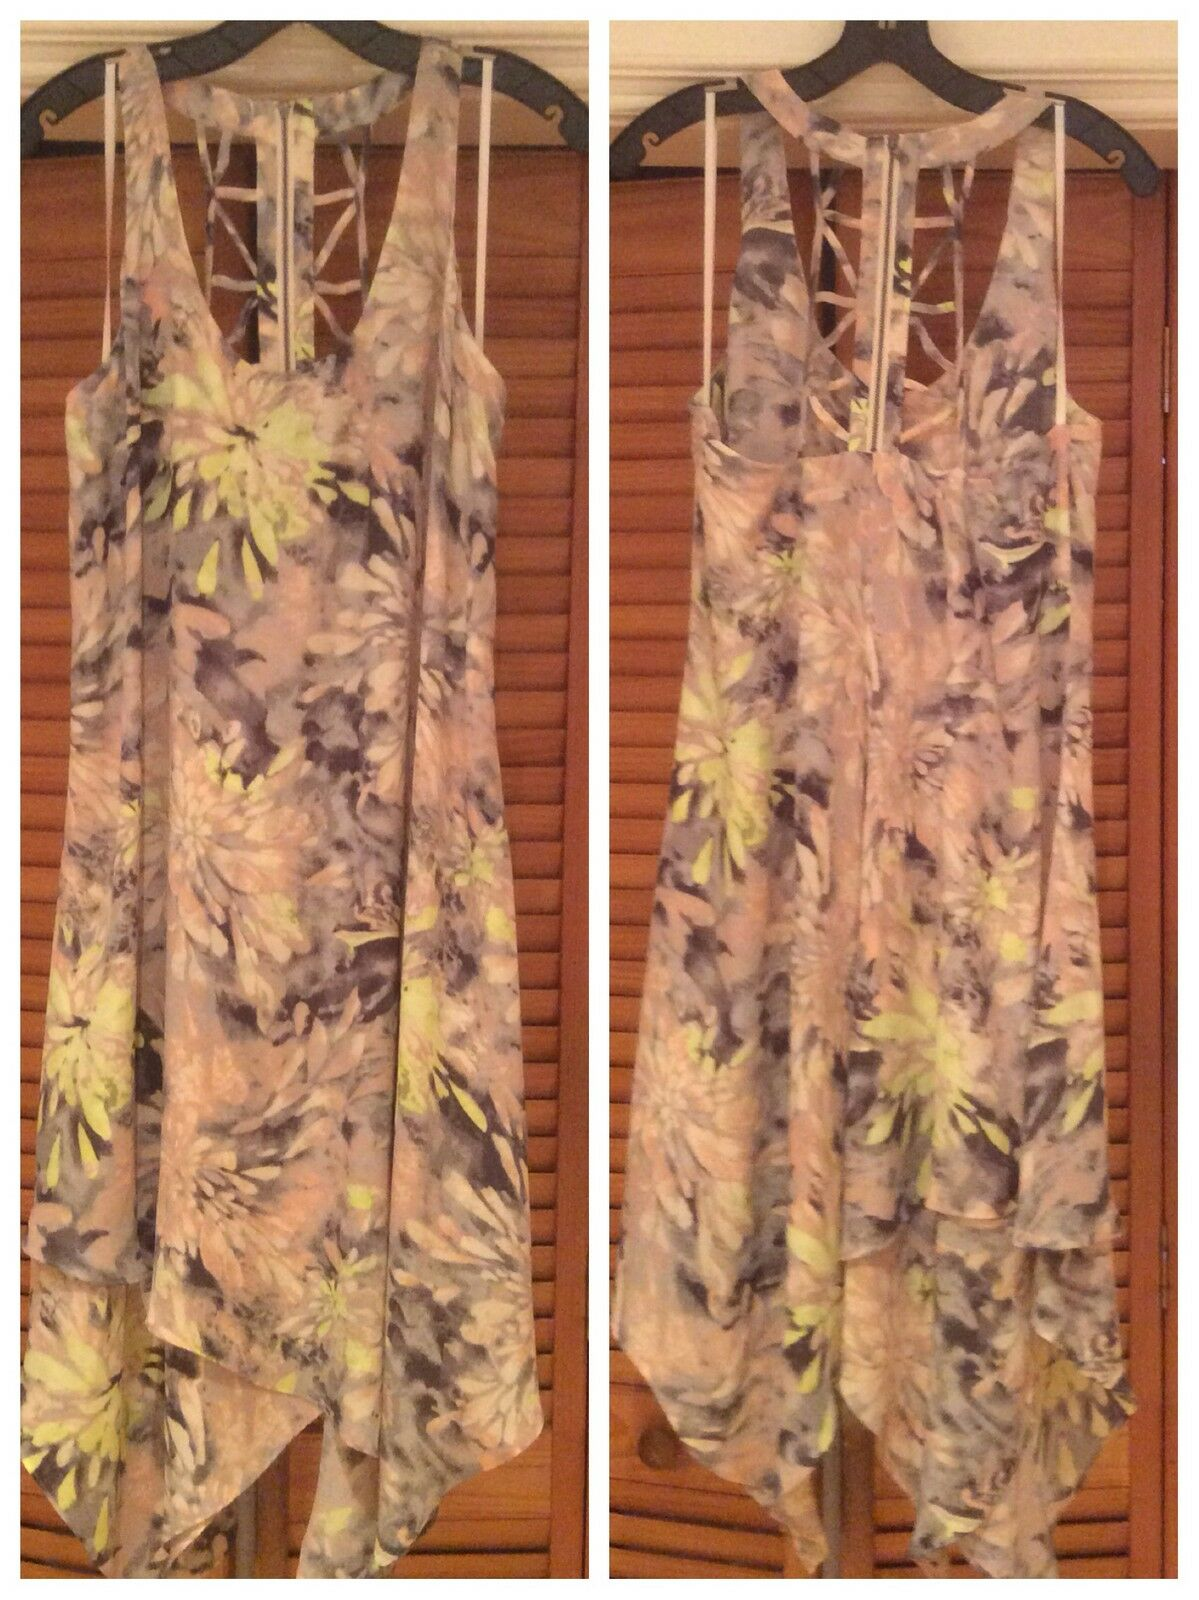 NEW BCBG MAXAZRIA CLARISSA MULTI Farbe SLEEVELESS DRESS Größe 10  PS66D93